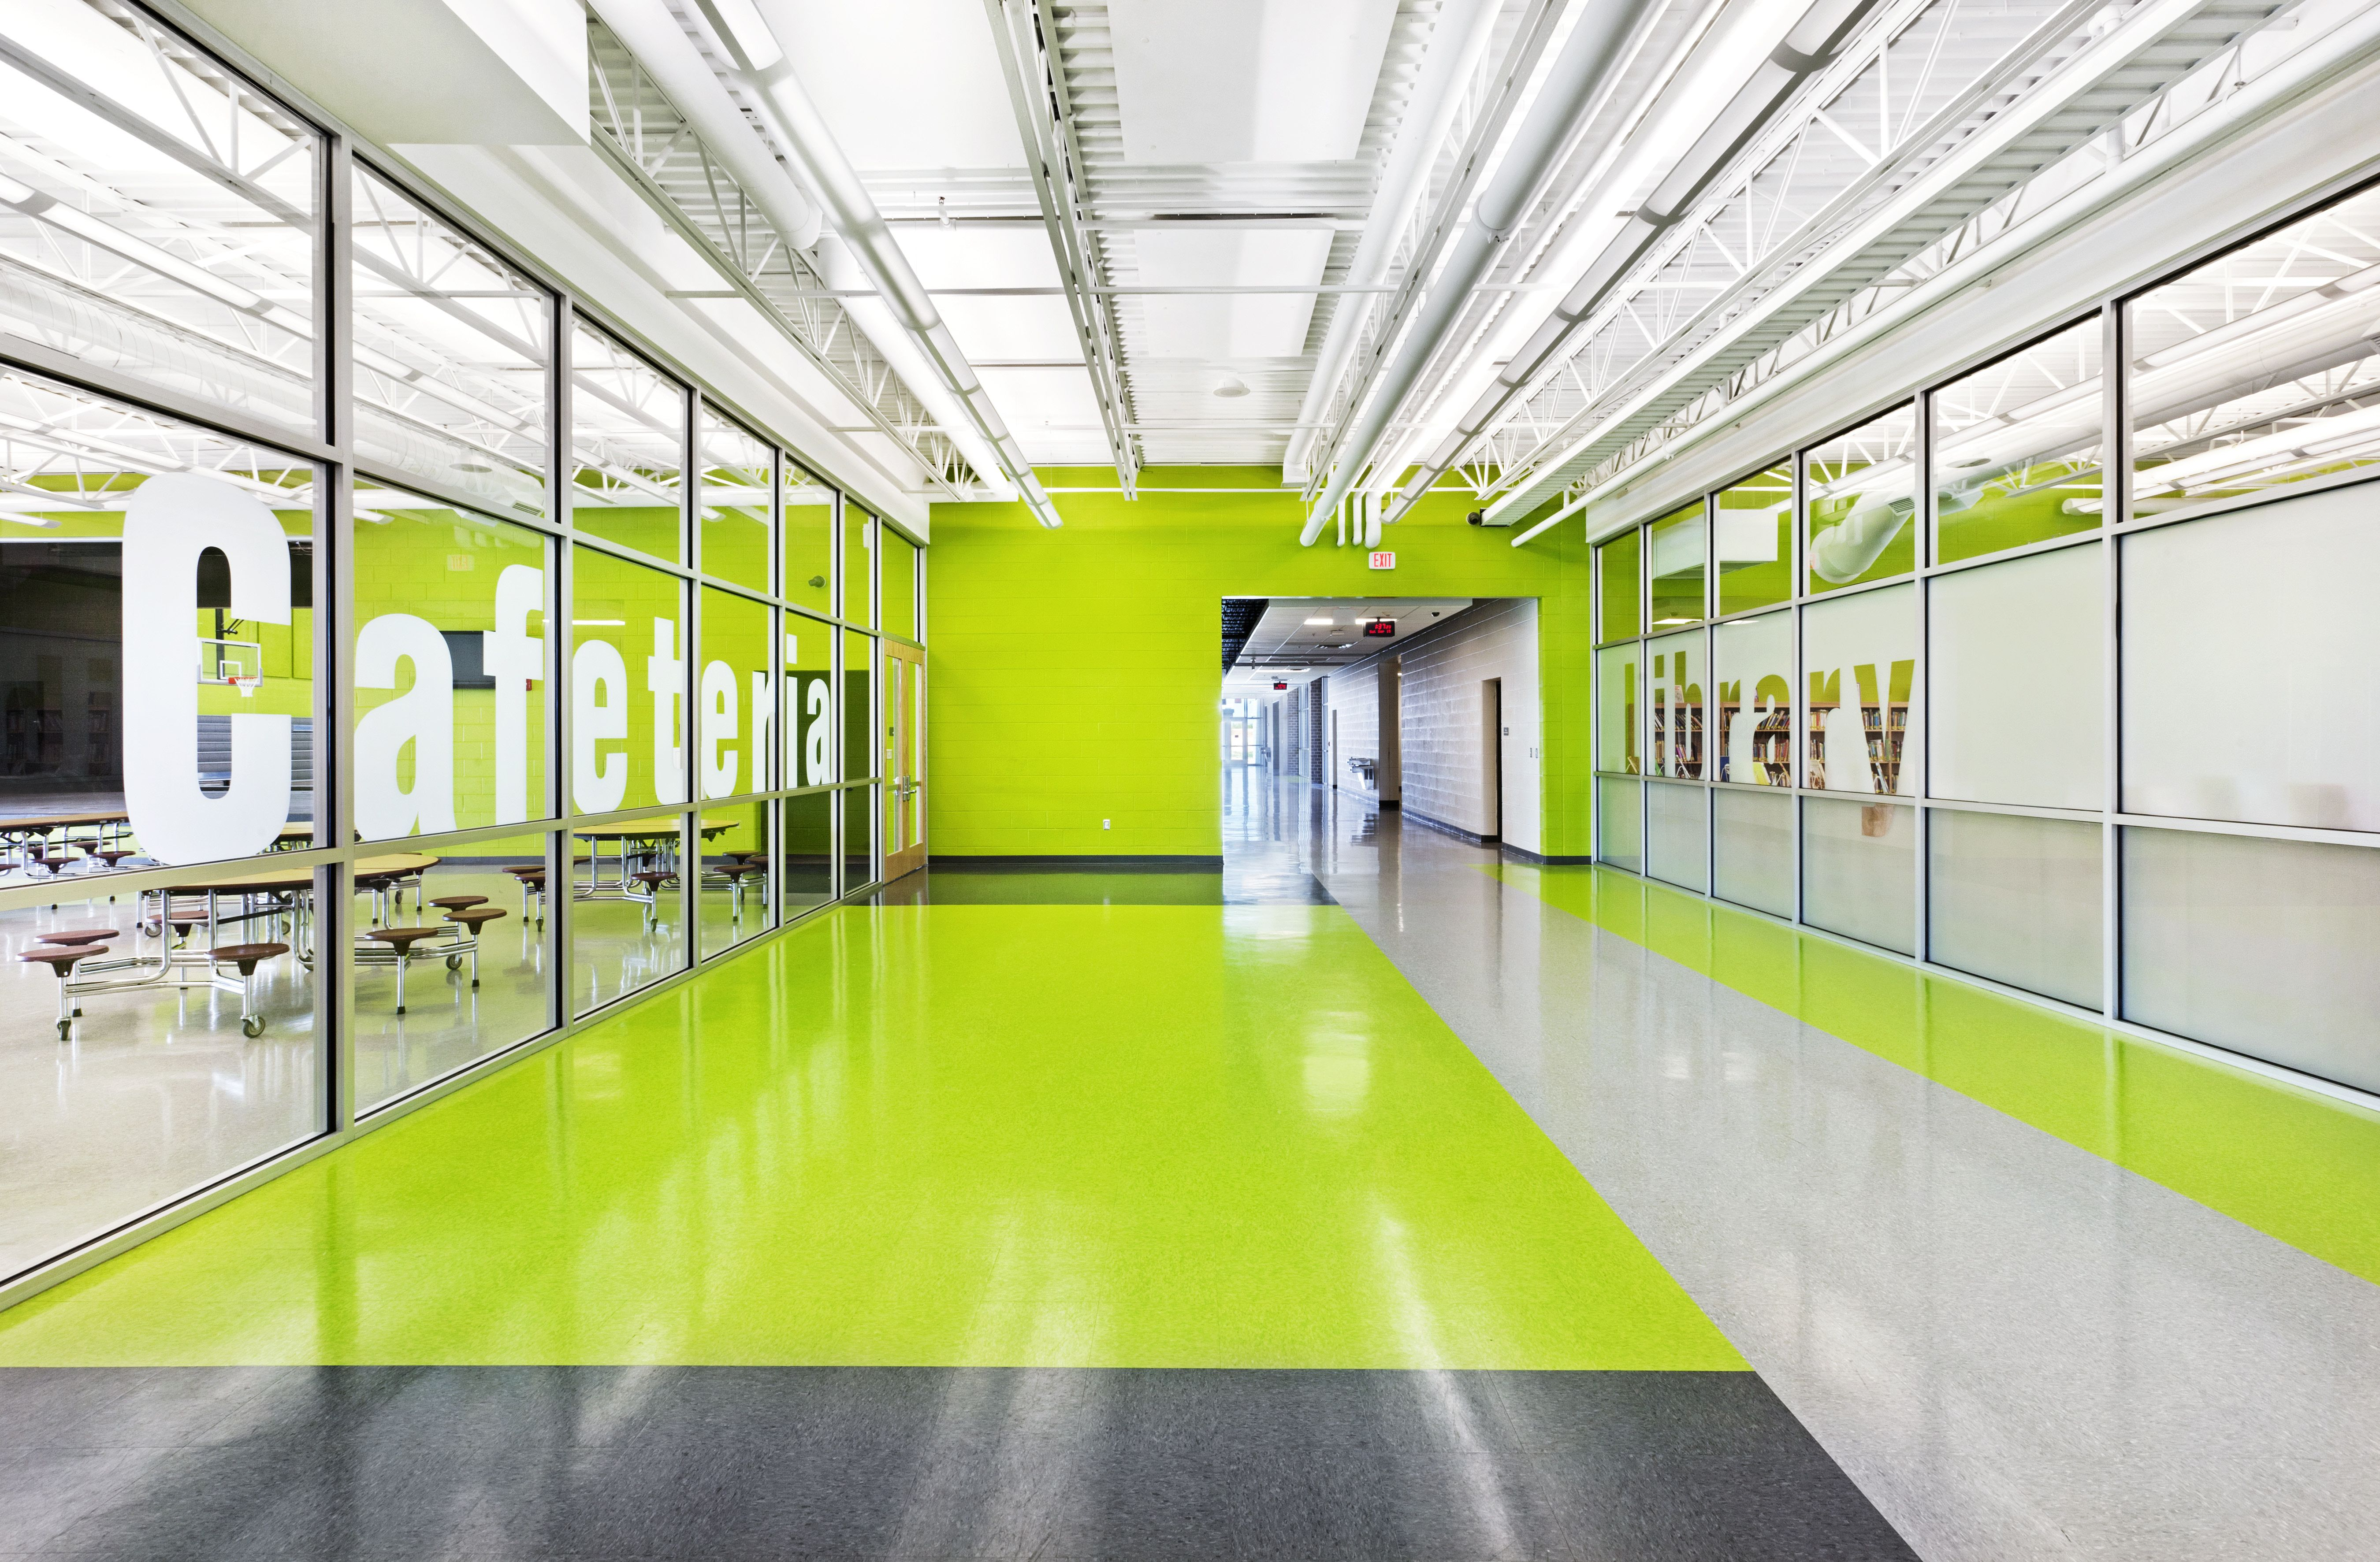 Wayfinding tiles school hallway google search for Schools with interior design programs